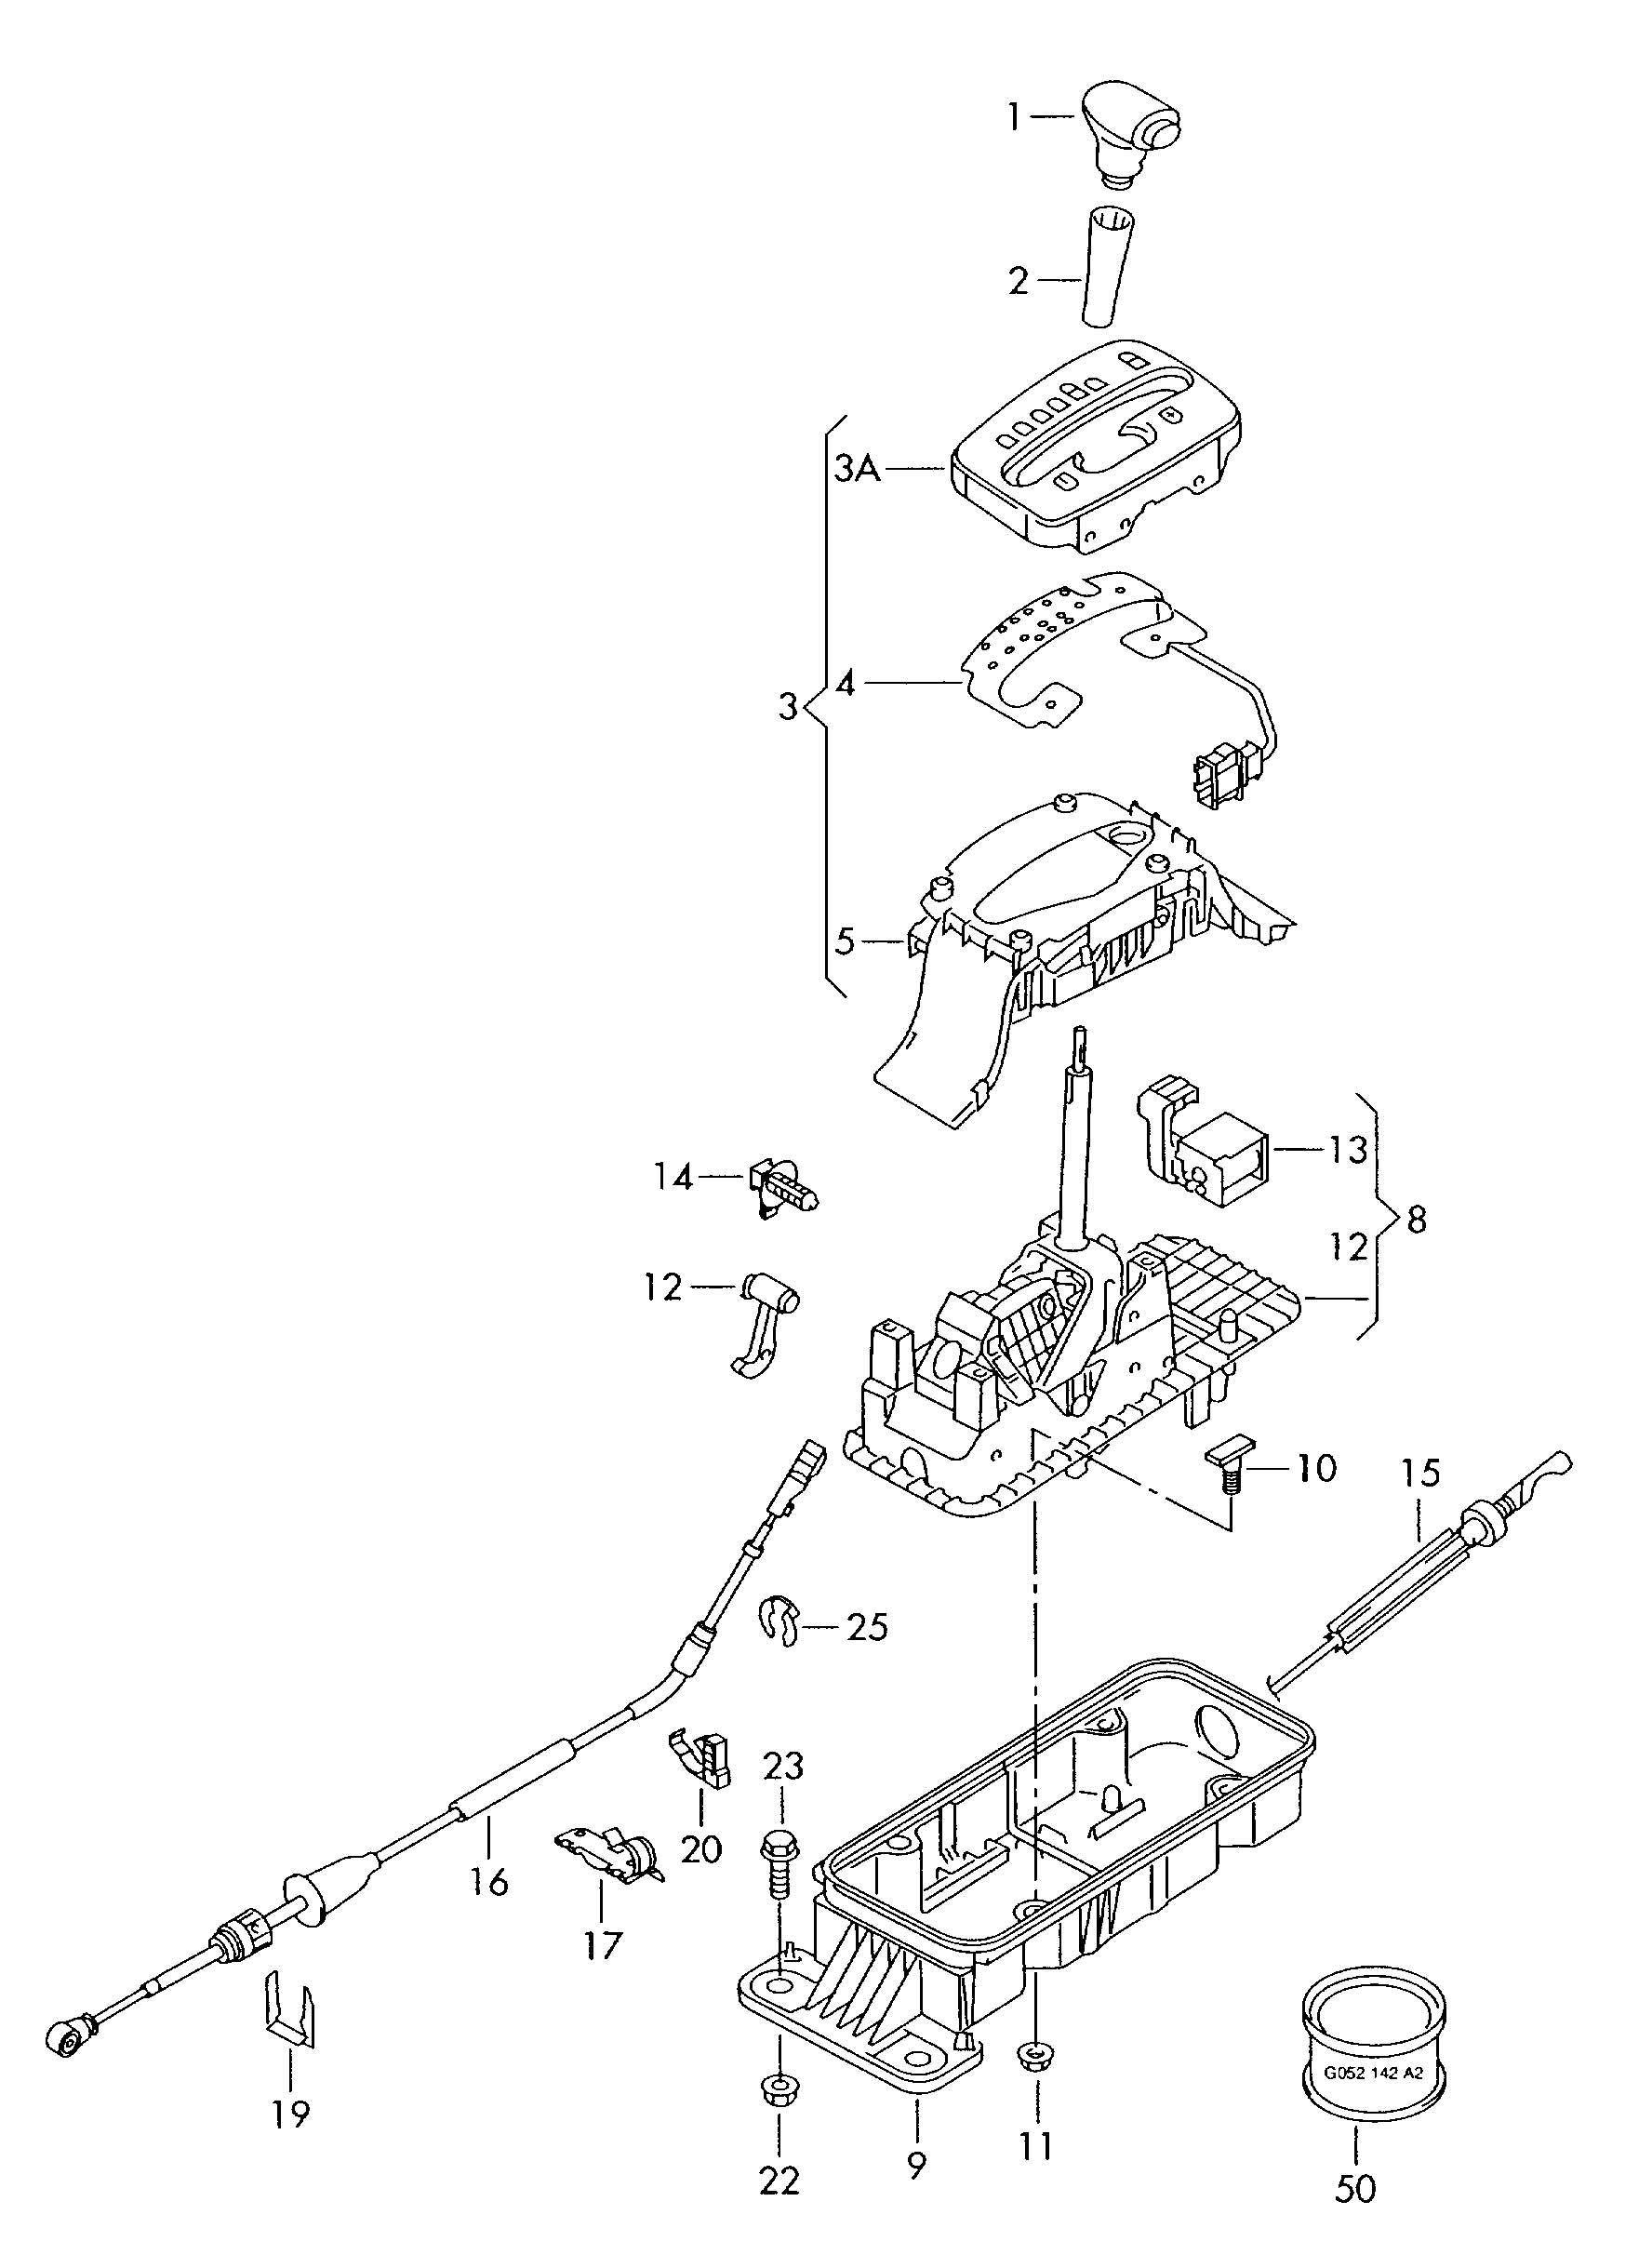 Volkswagen Jetta Shift Mechanism Assembly Assembly Assy